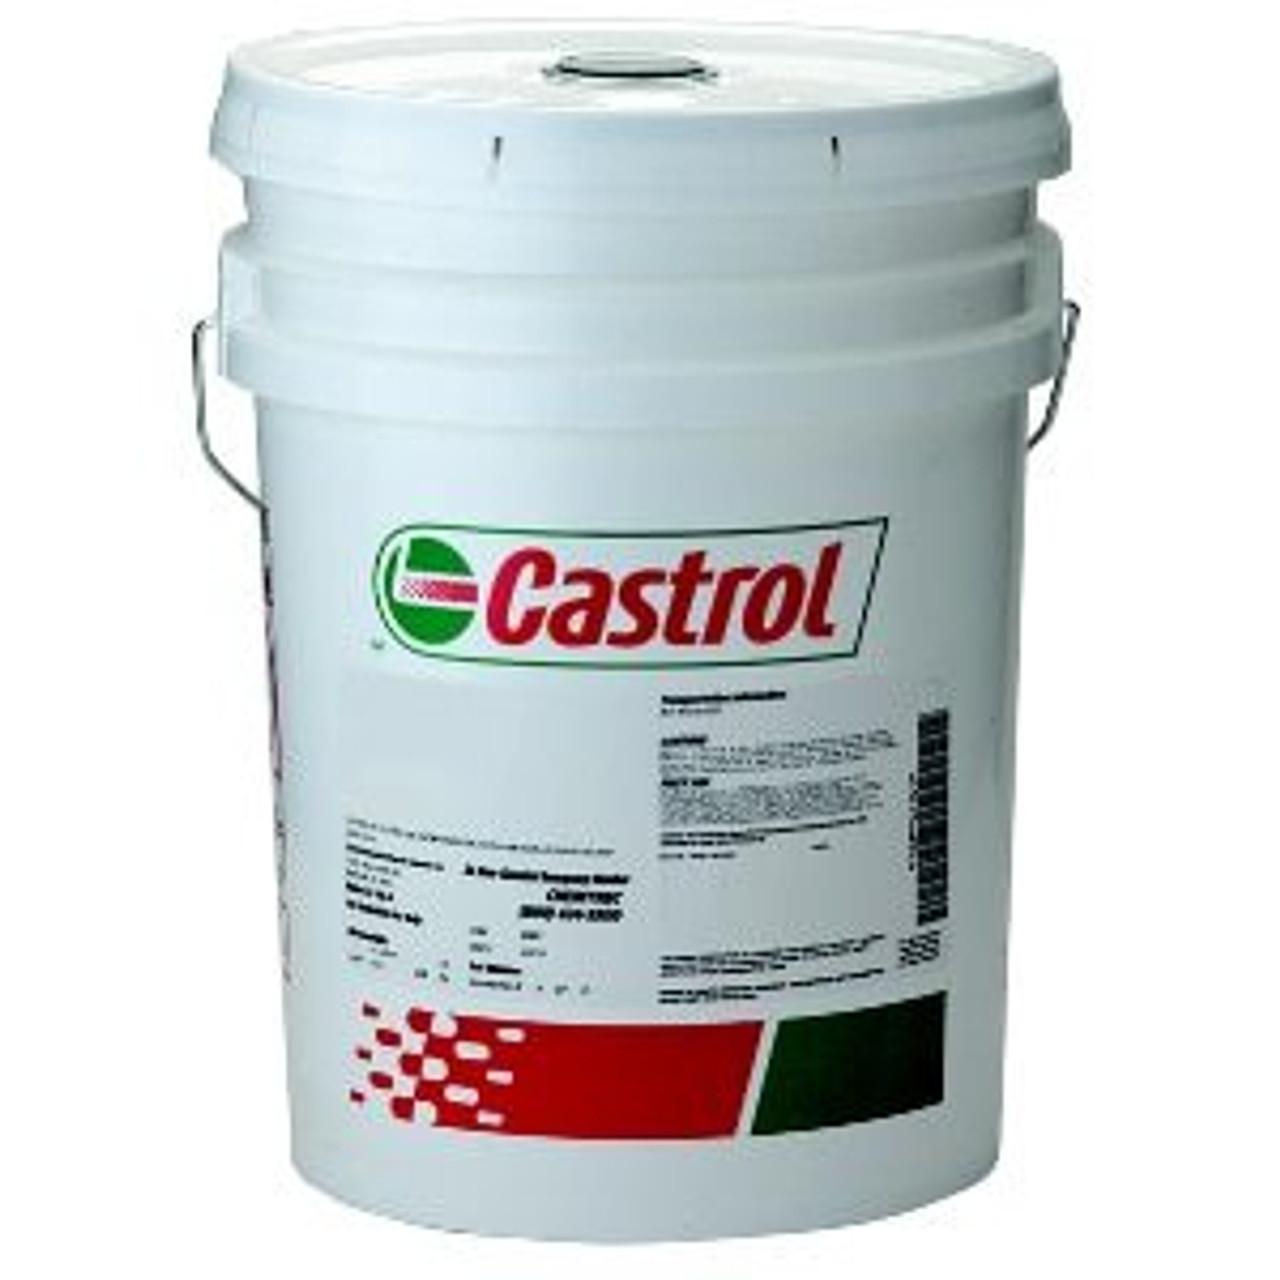 Castrol Techniclean  MP Flex (previously Kleen 3625) - Heavy Duty Multi-Purpose Alkaline Cleaner - 5 Gallon Pail